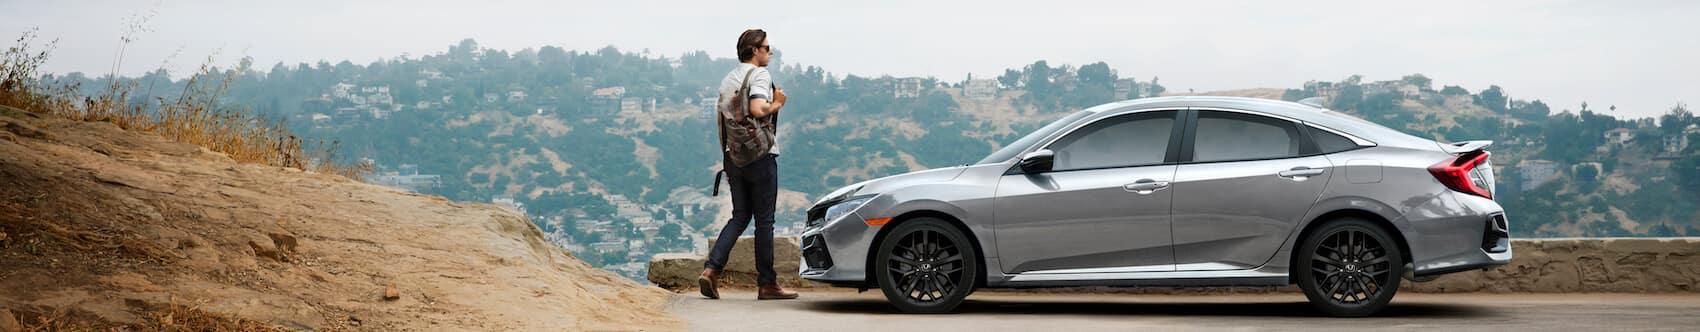 Honda Dealer near Me   Laguna Hills, CA